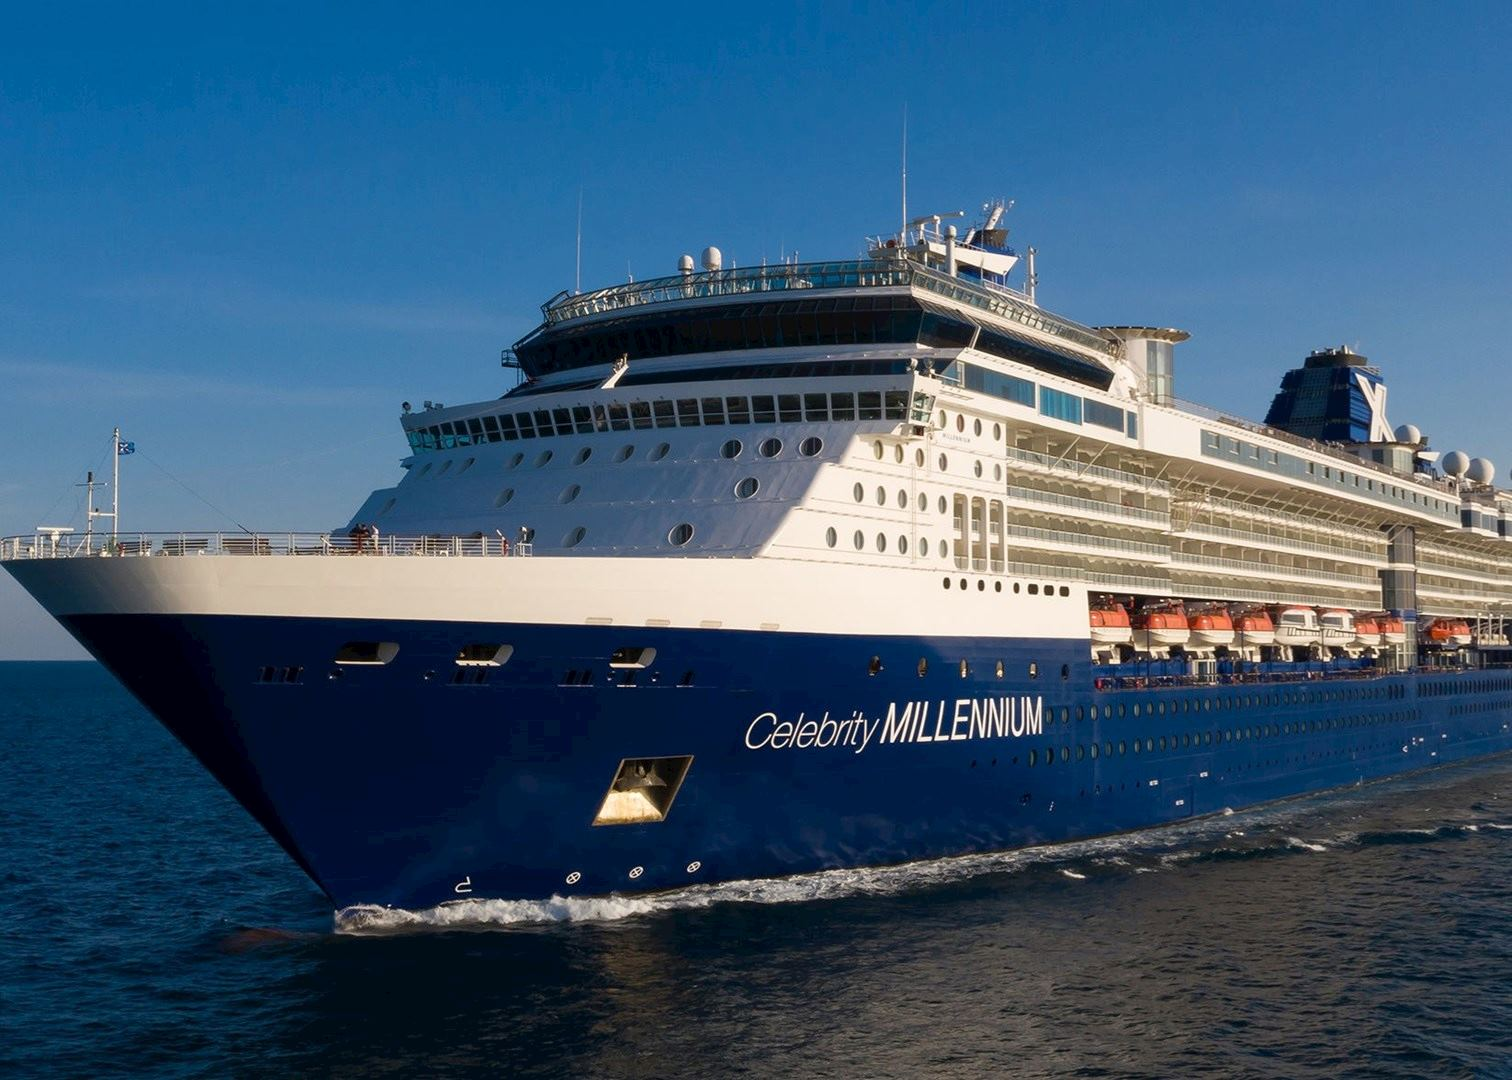 7-Night Alaska Northern Glacier Cruise - Celebrity Cruises